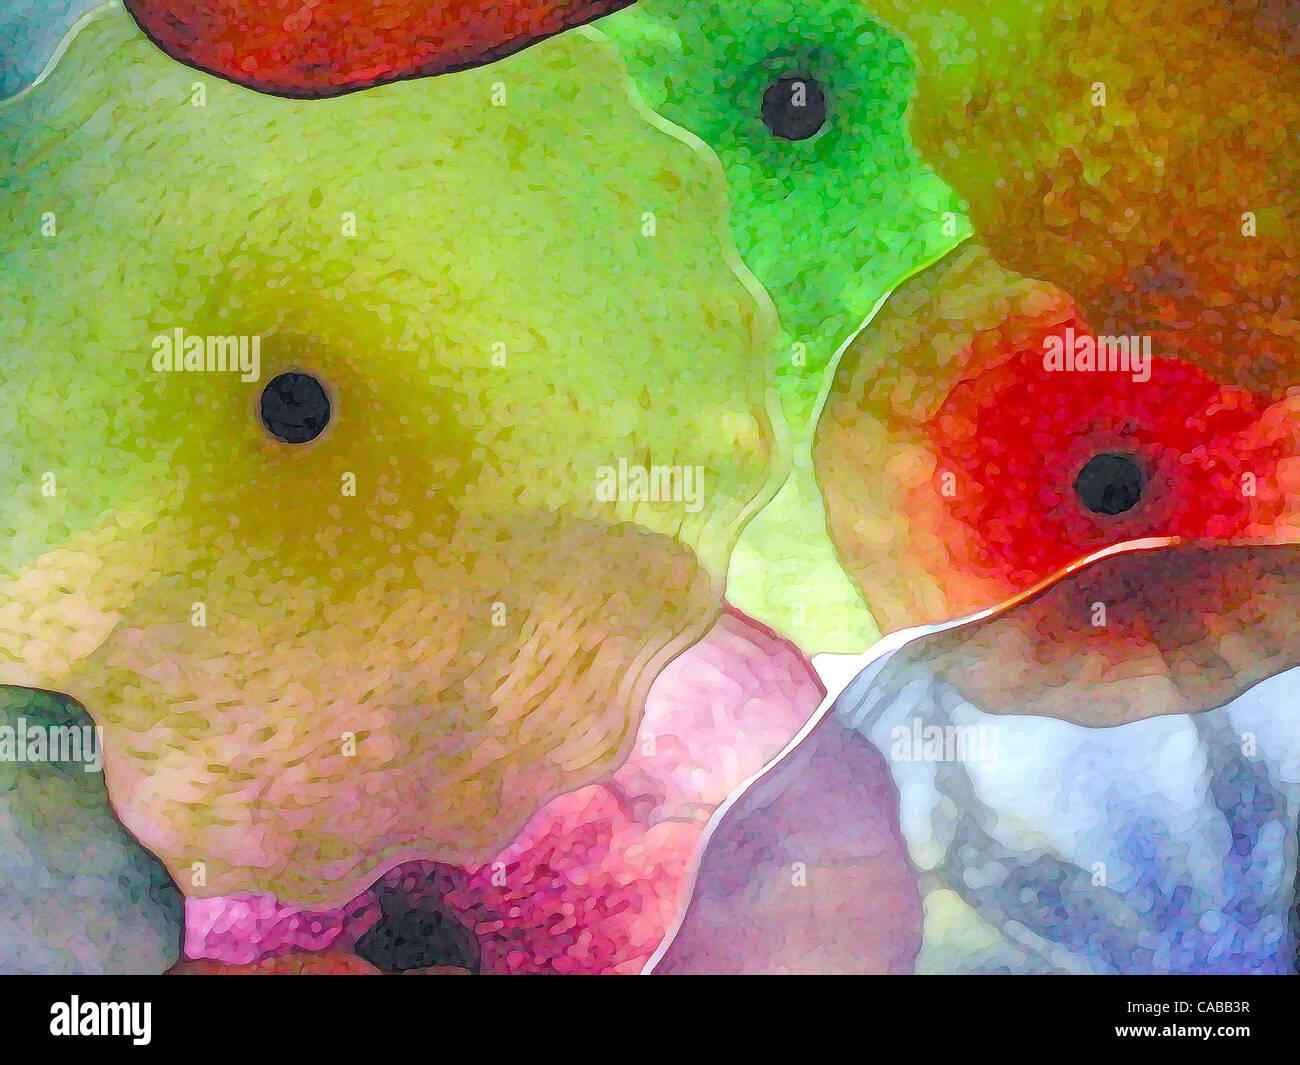 3. Juni 2004; Los Angeles, Kalifornien, USA; Abstrakte Glasblumen. Stockbild